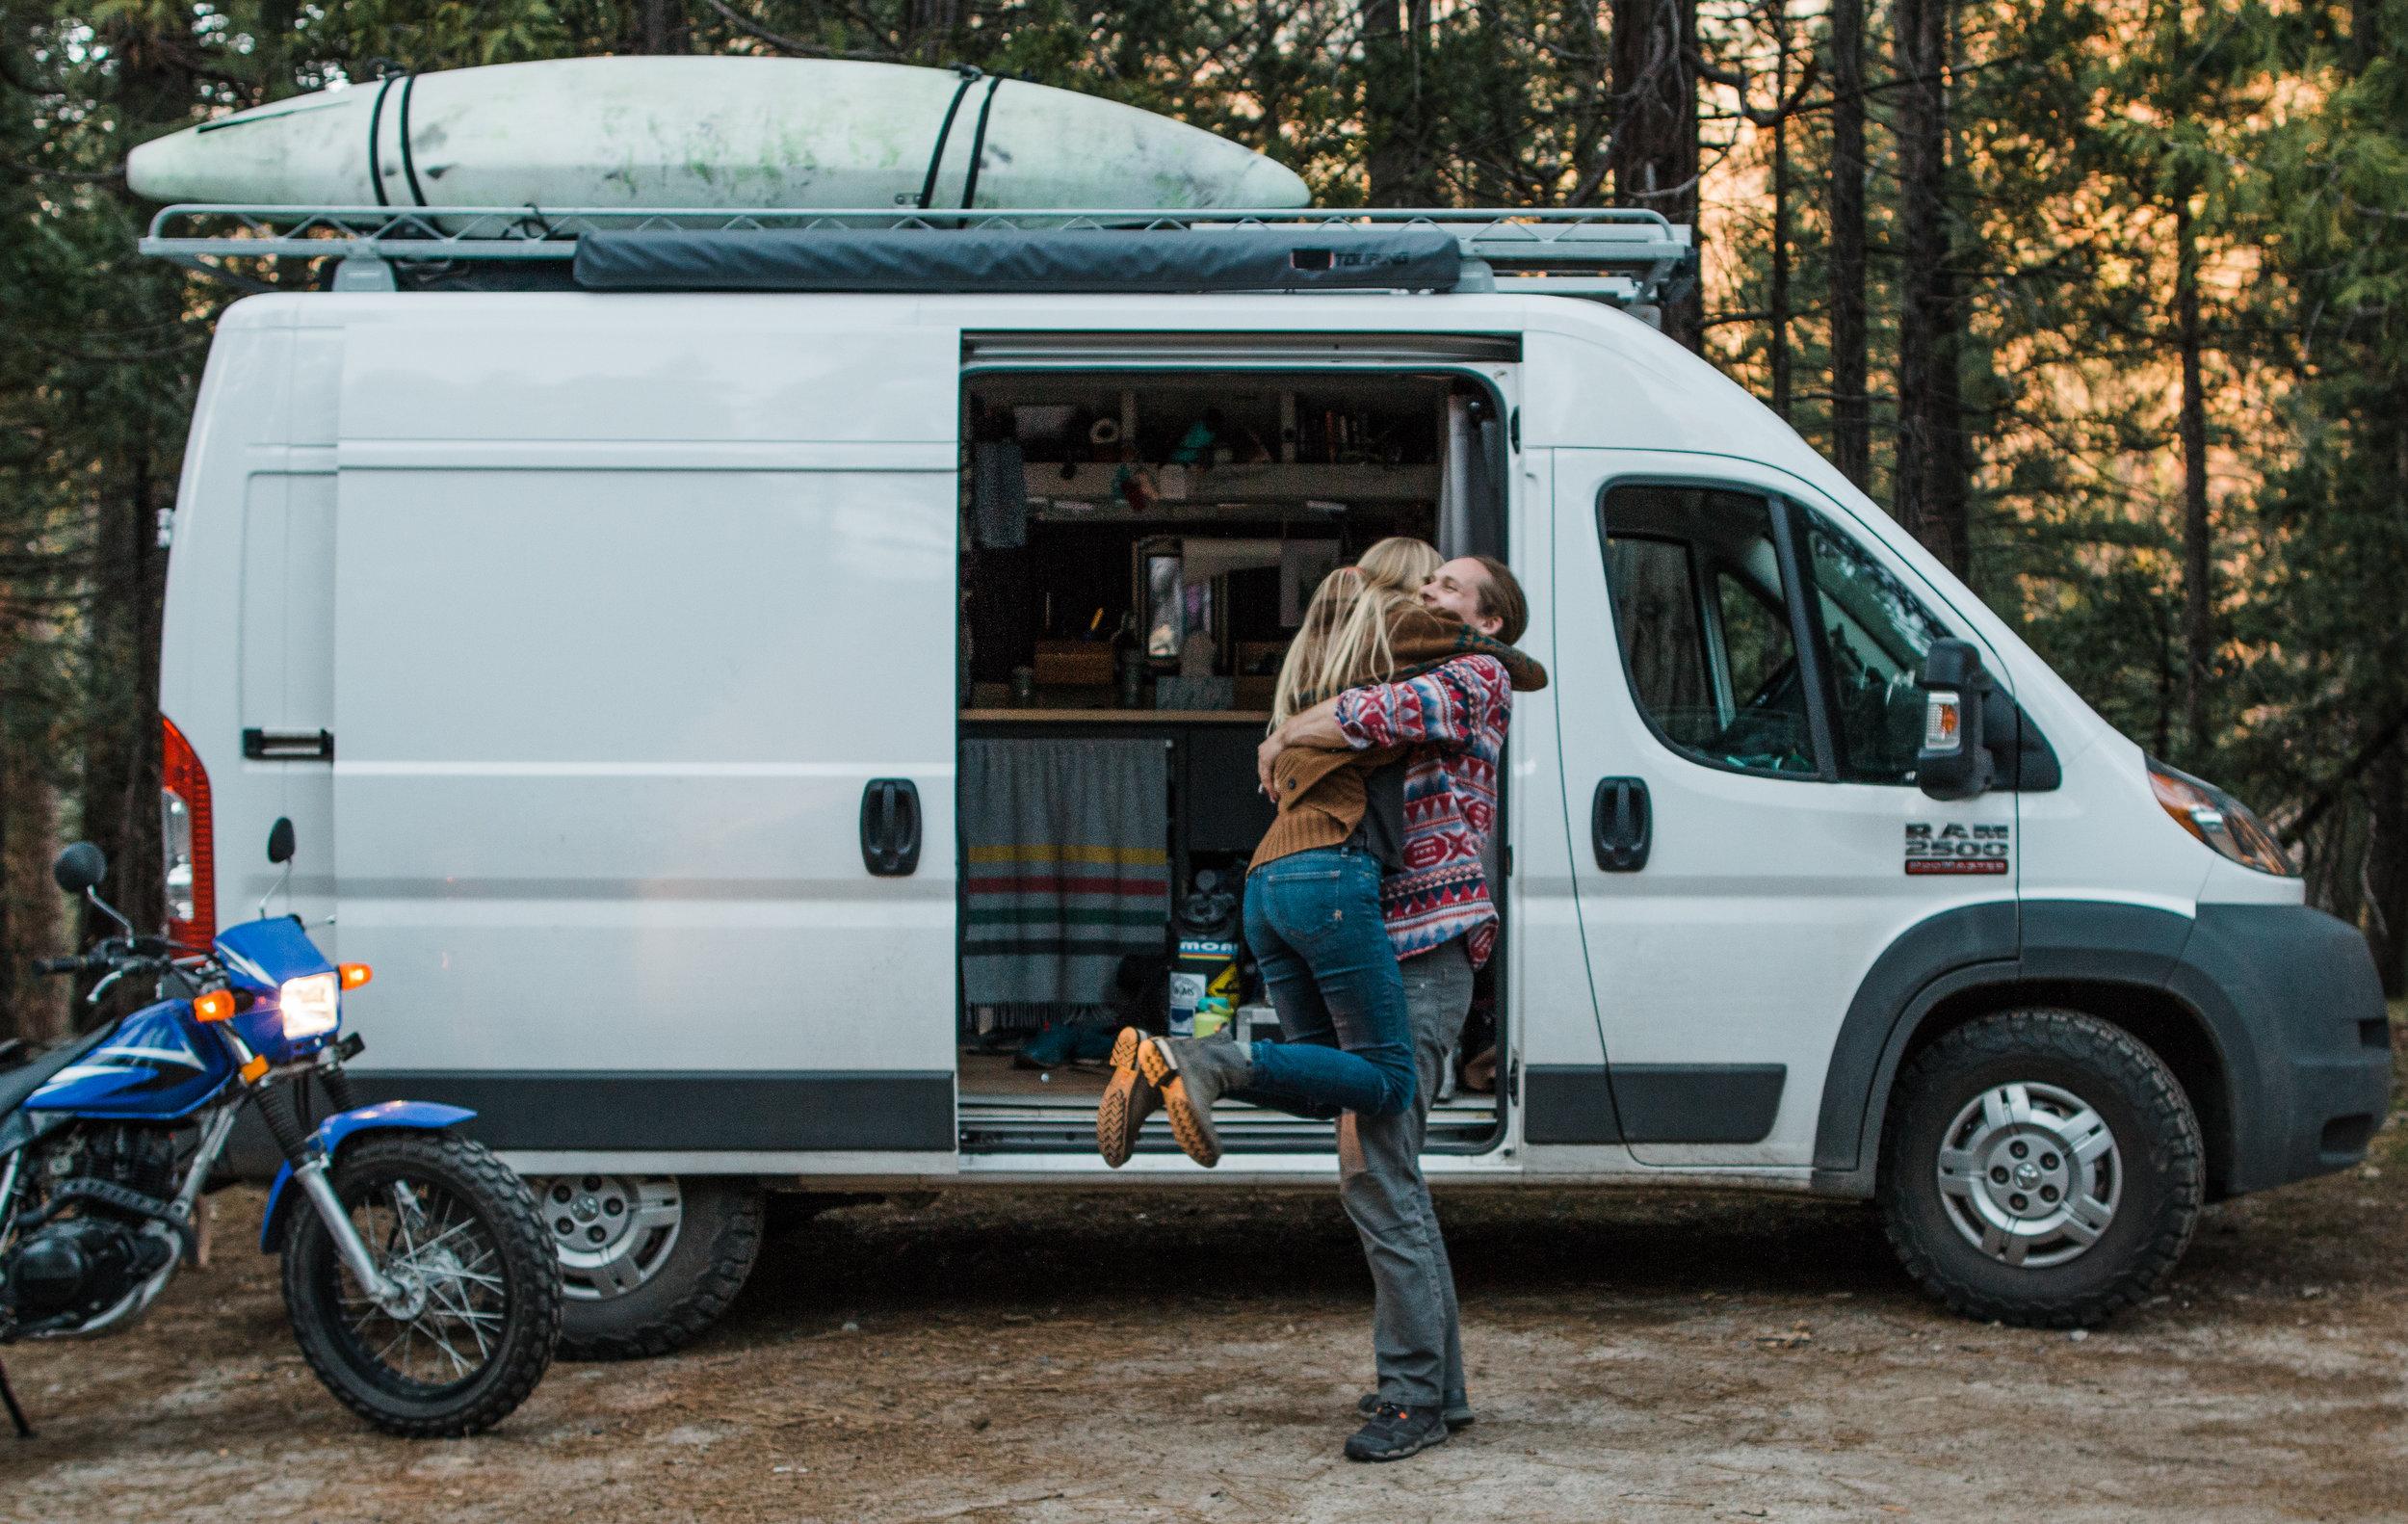 the-hearnes-adventure-wedding-elopement-photographer-yosemite-california-utah-elopement-photographer-west-coast-wedding-photographer-florida-elopement-photographer-east-coast-elopement-photographer-hiking-adventure-session